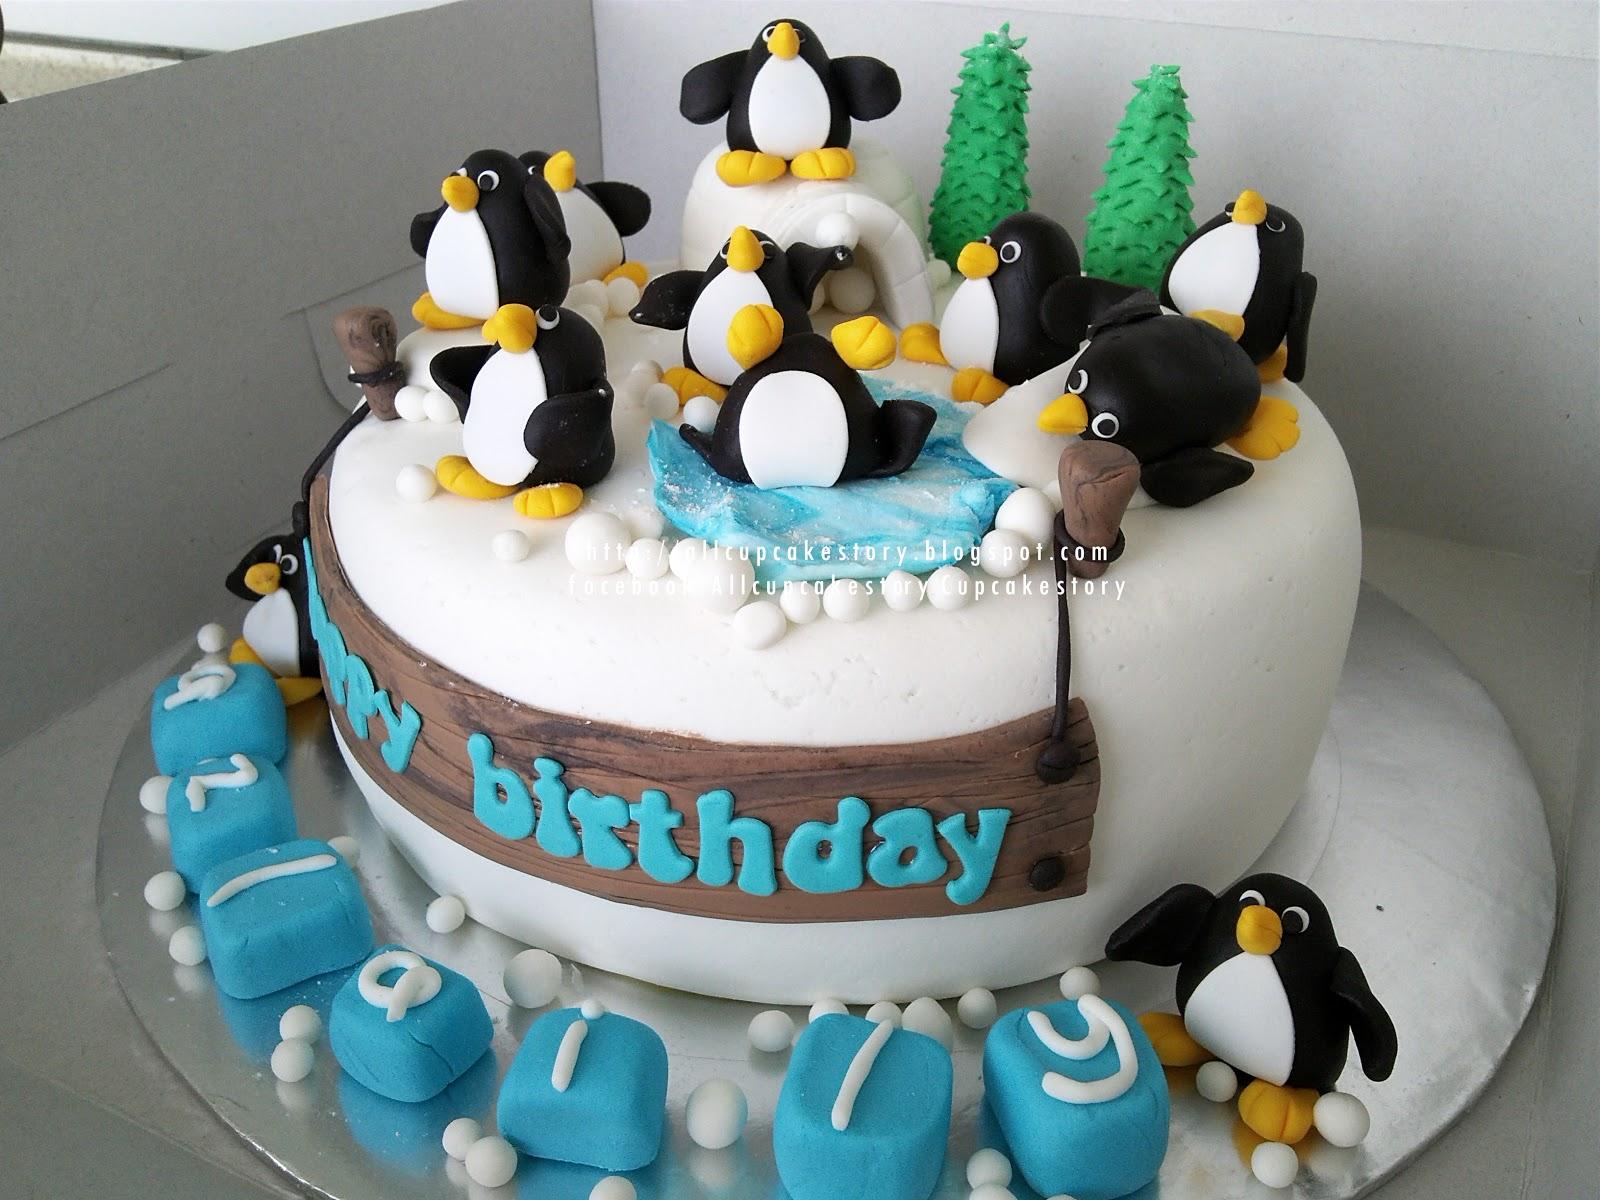 Allcupcakestory Penguin Birthday Cake